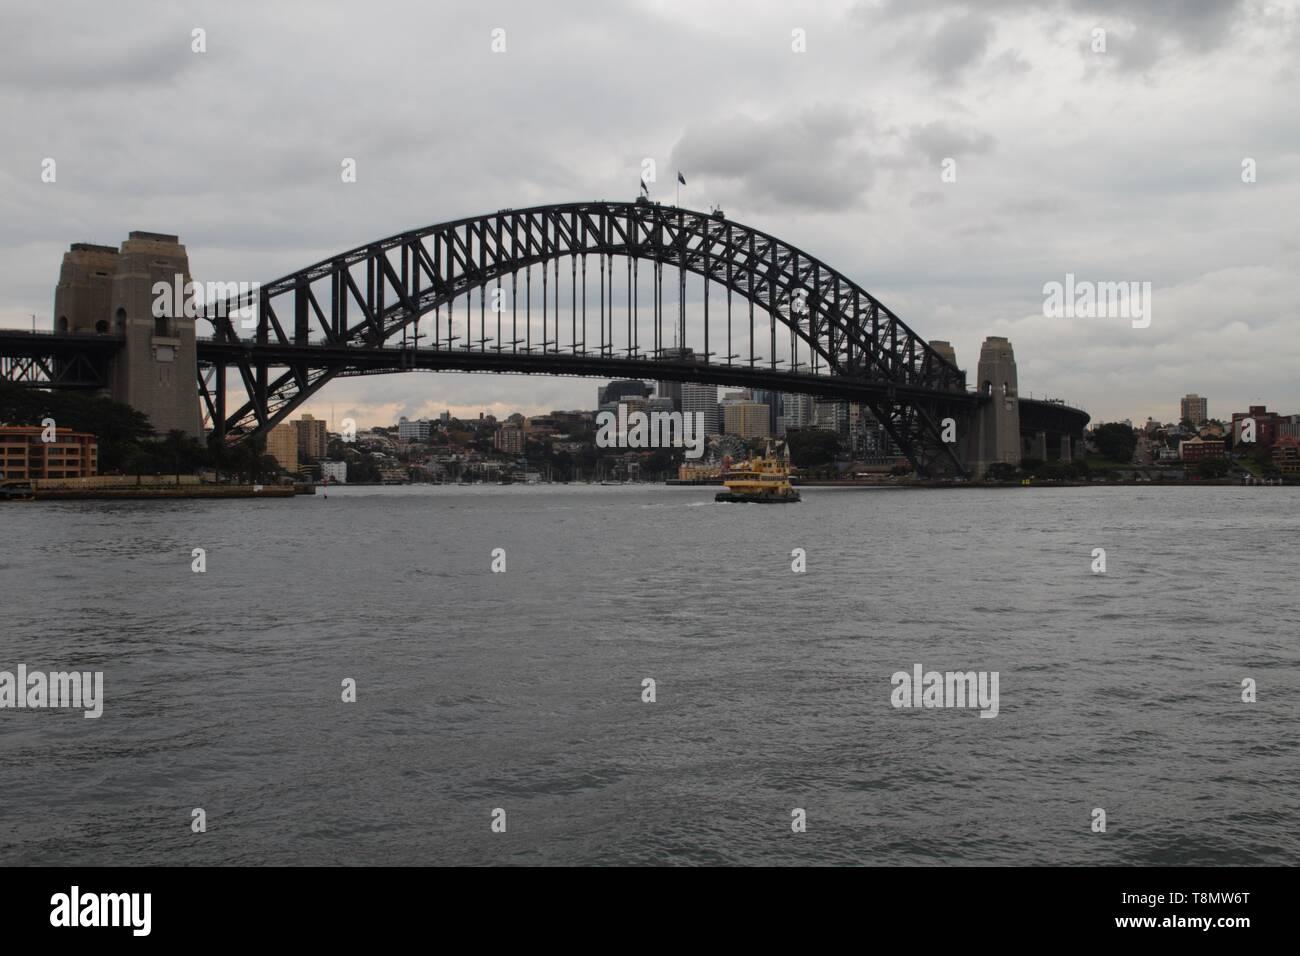 Sydney harbour bridge early morning - Stock Image